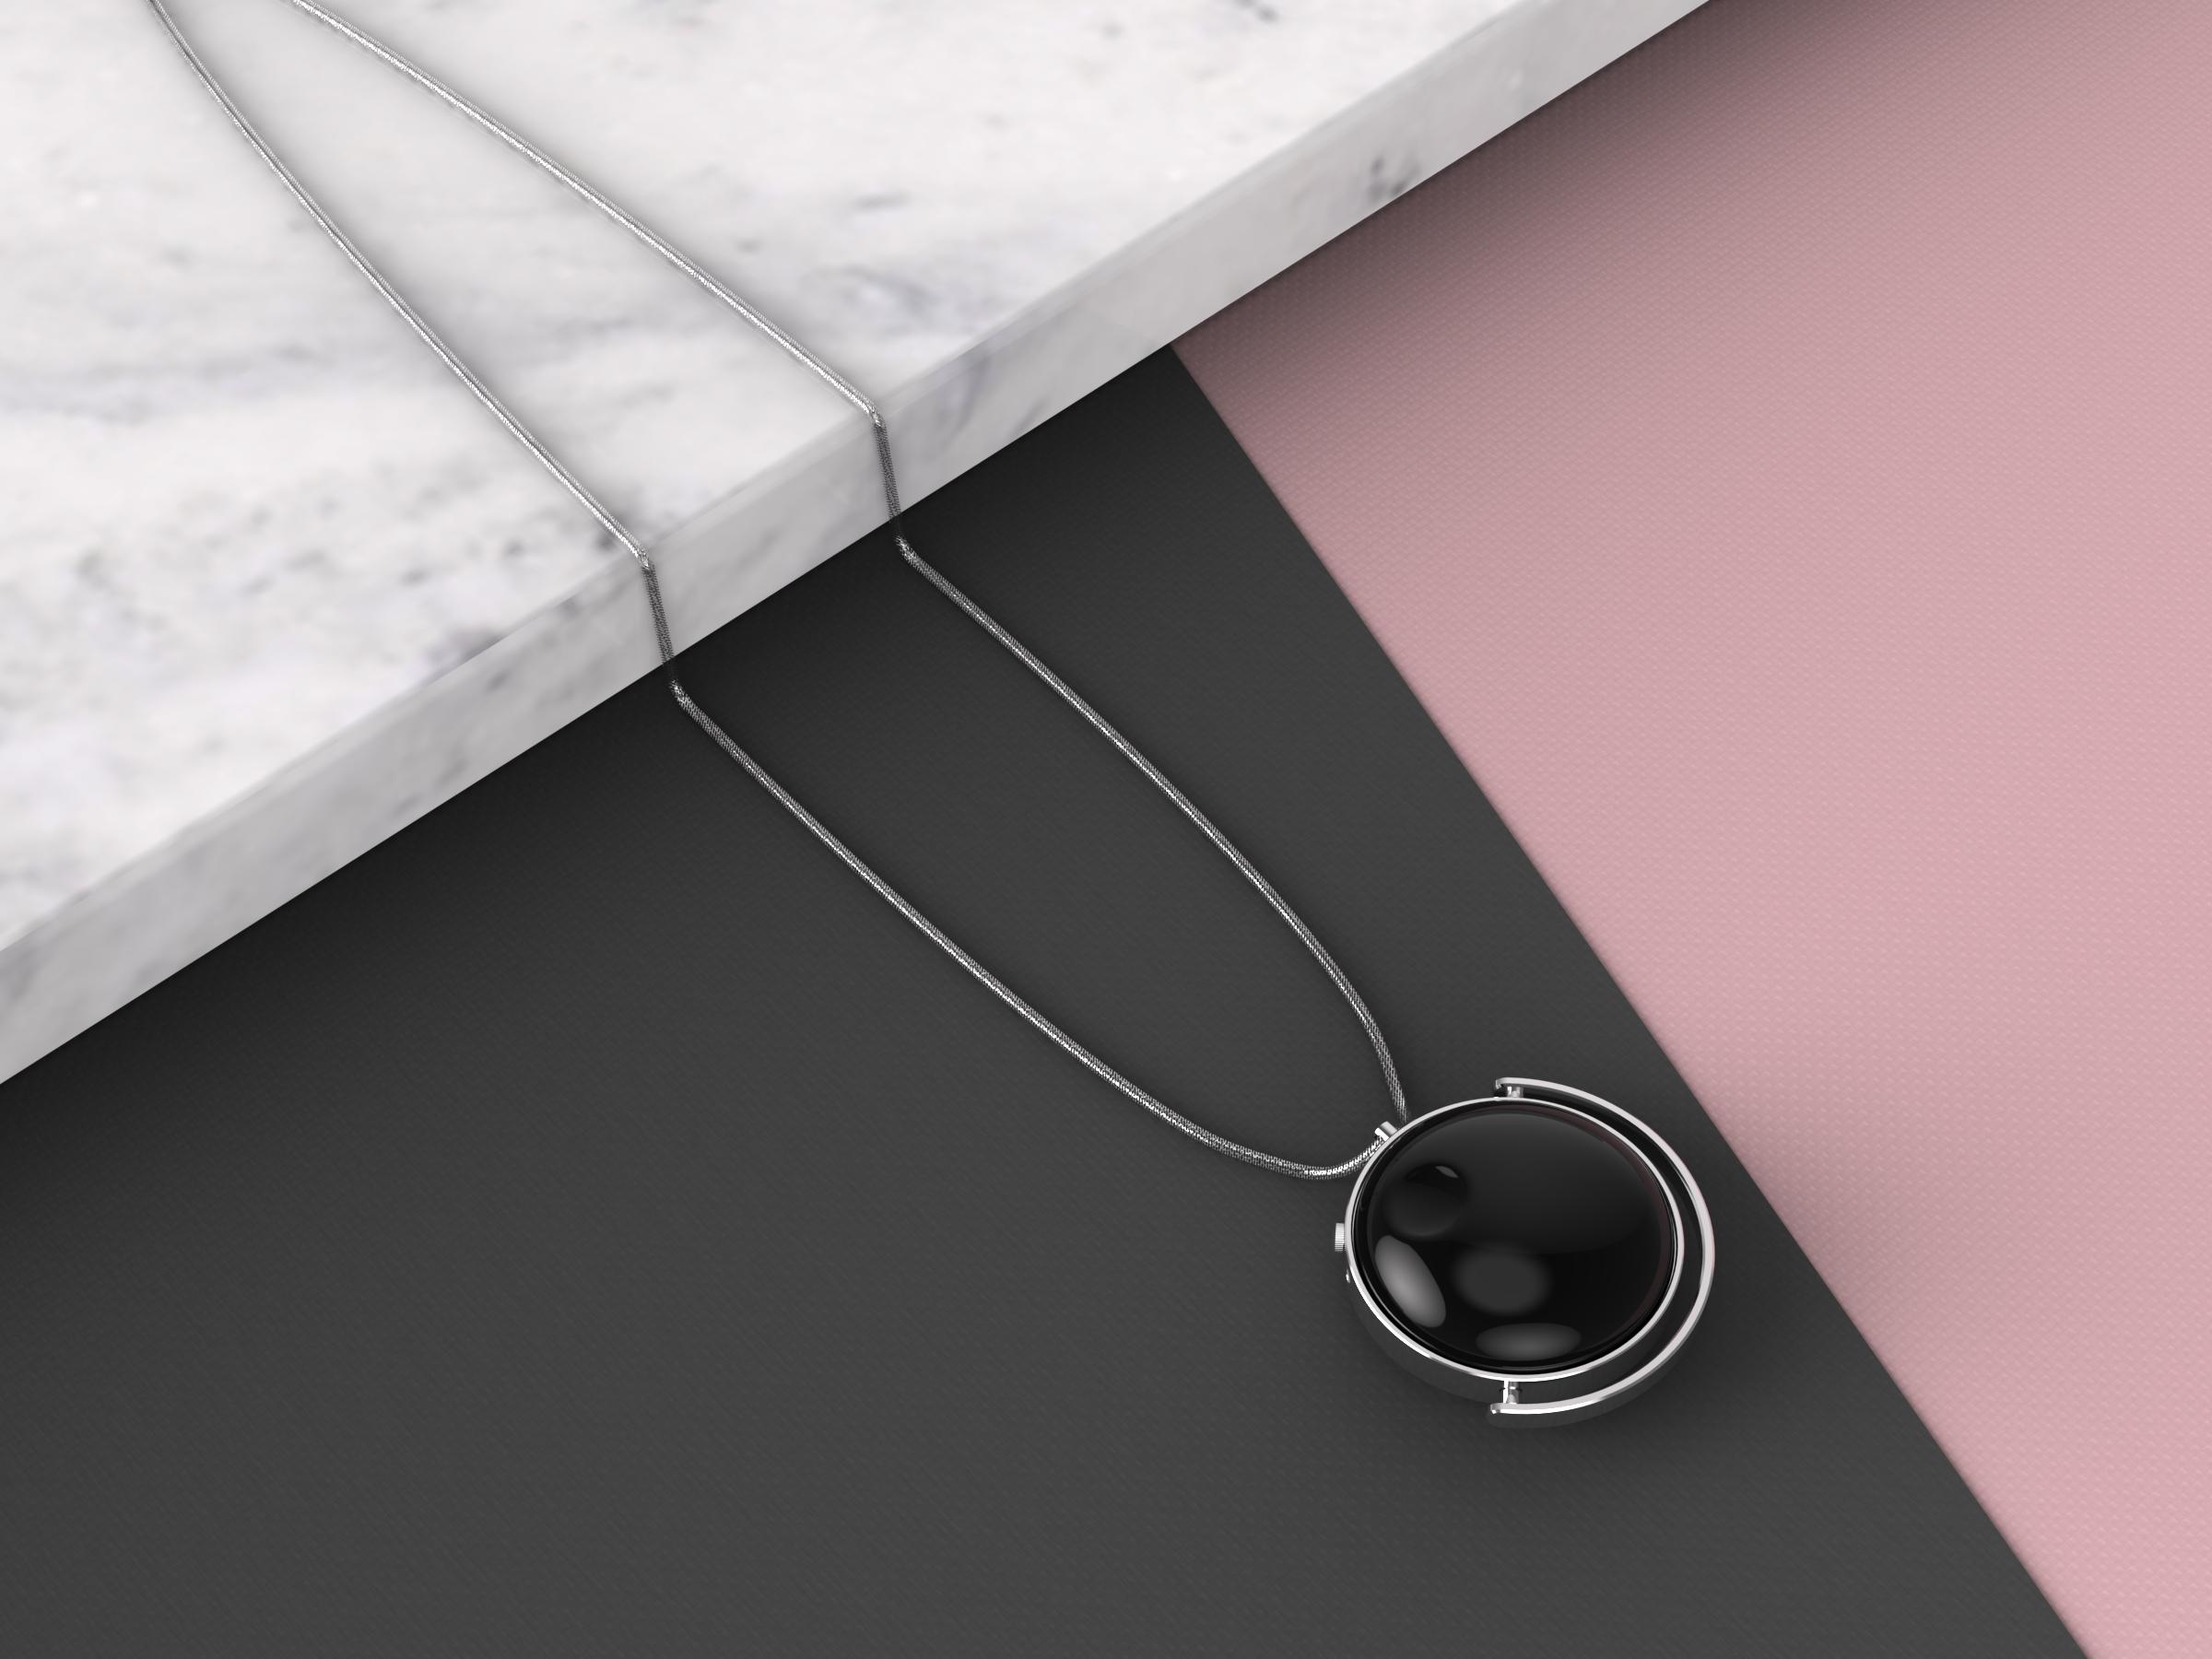 002_Wisp_Whisper_sensual jewellery.jpg